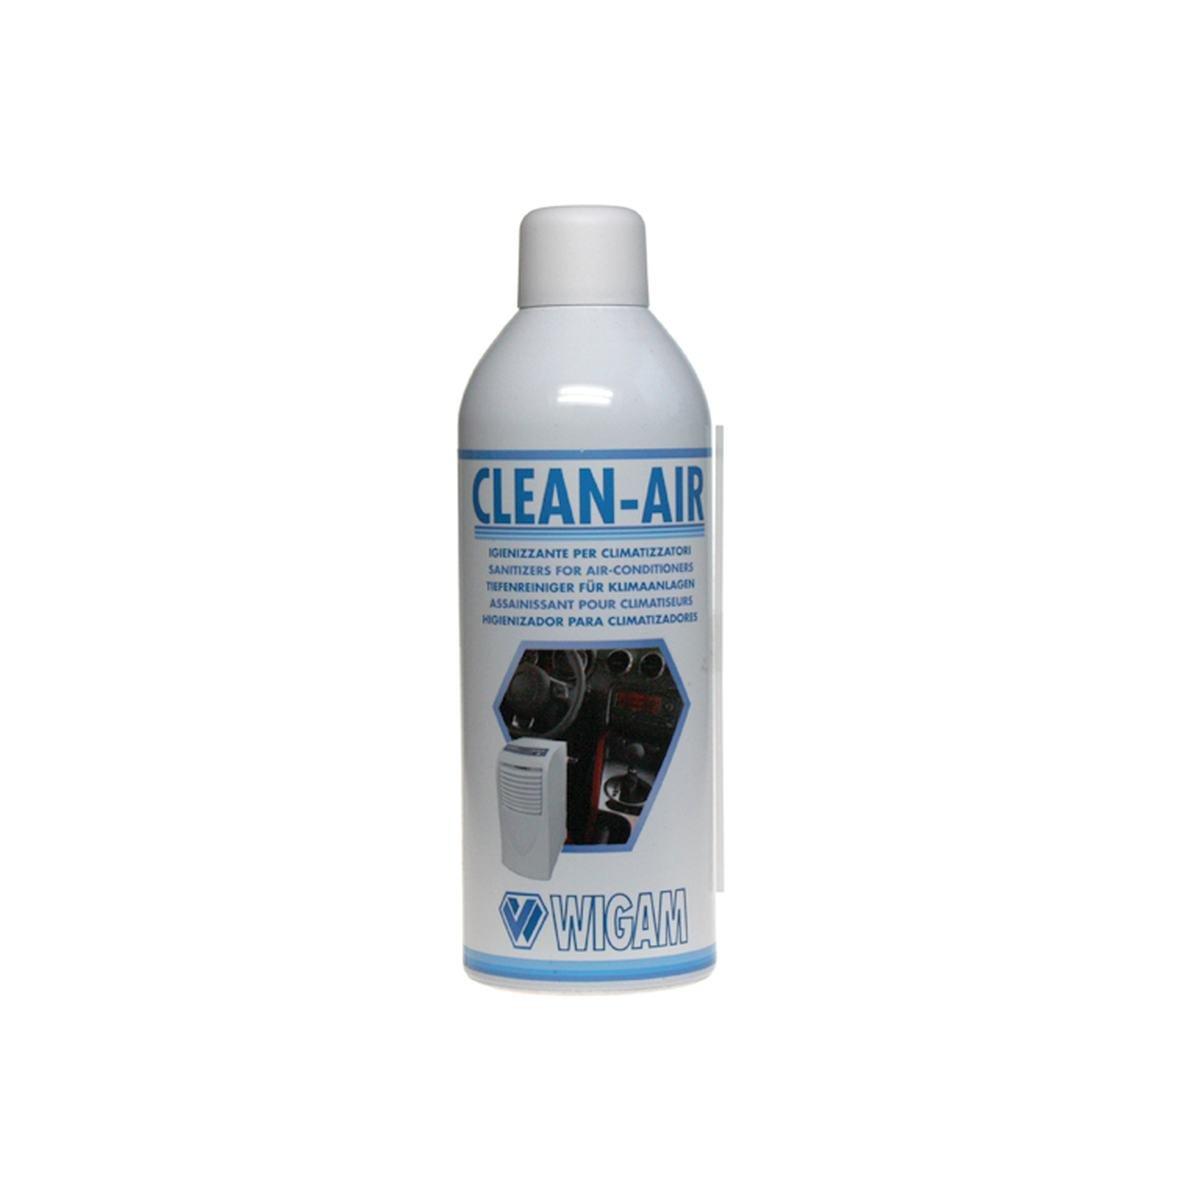 Clean-air desinfektionsspray på boks med 400 ml.